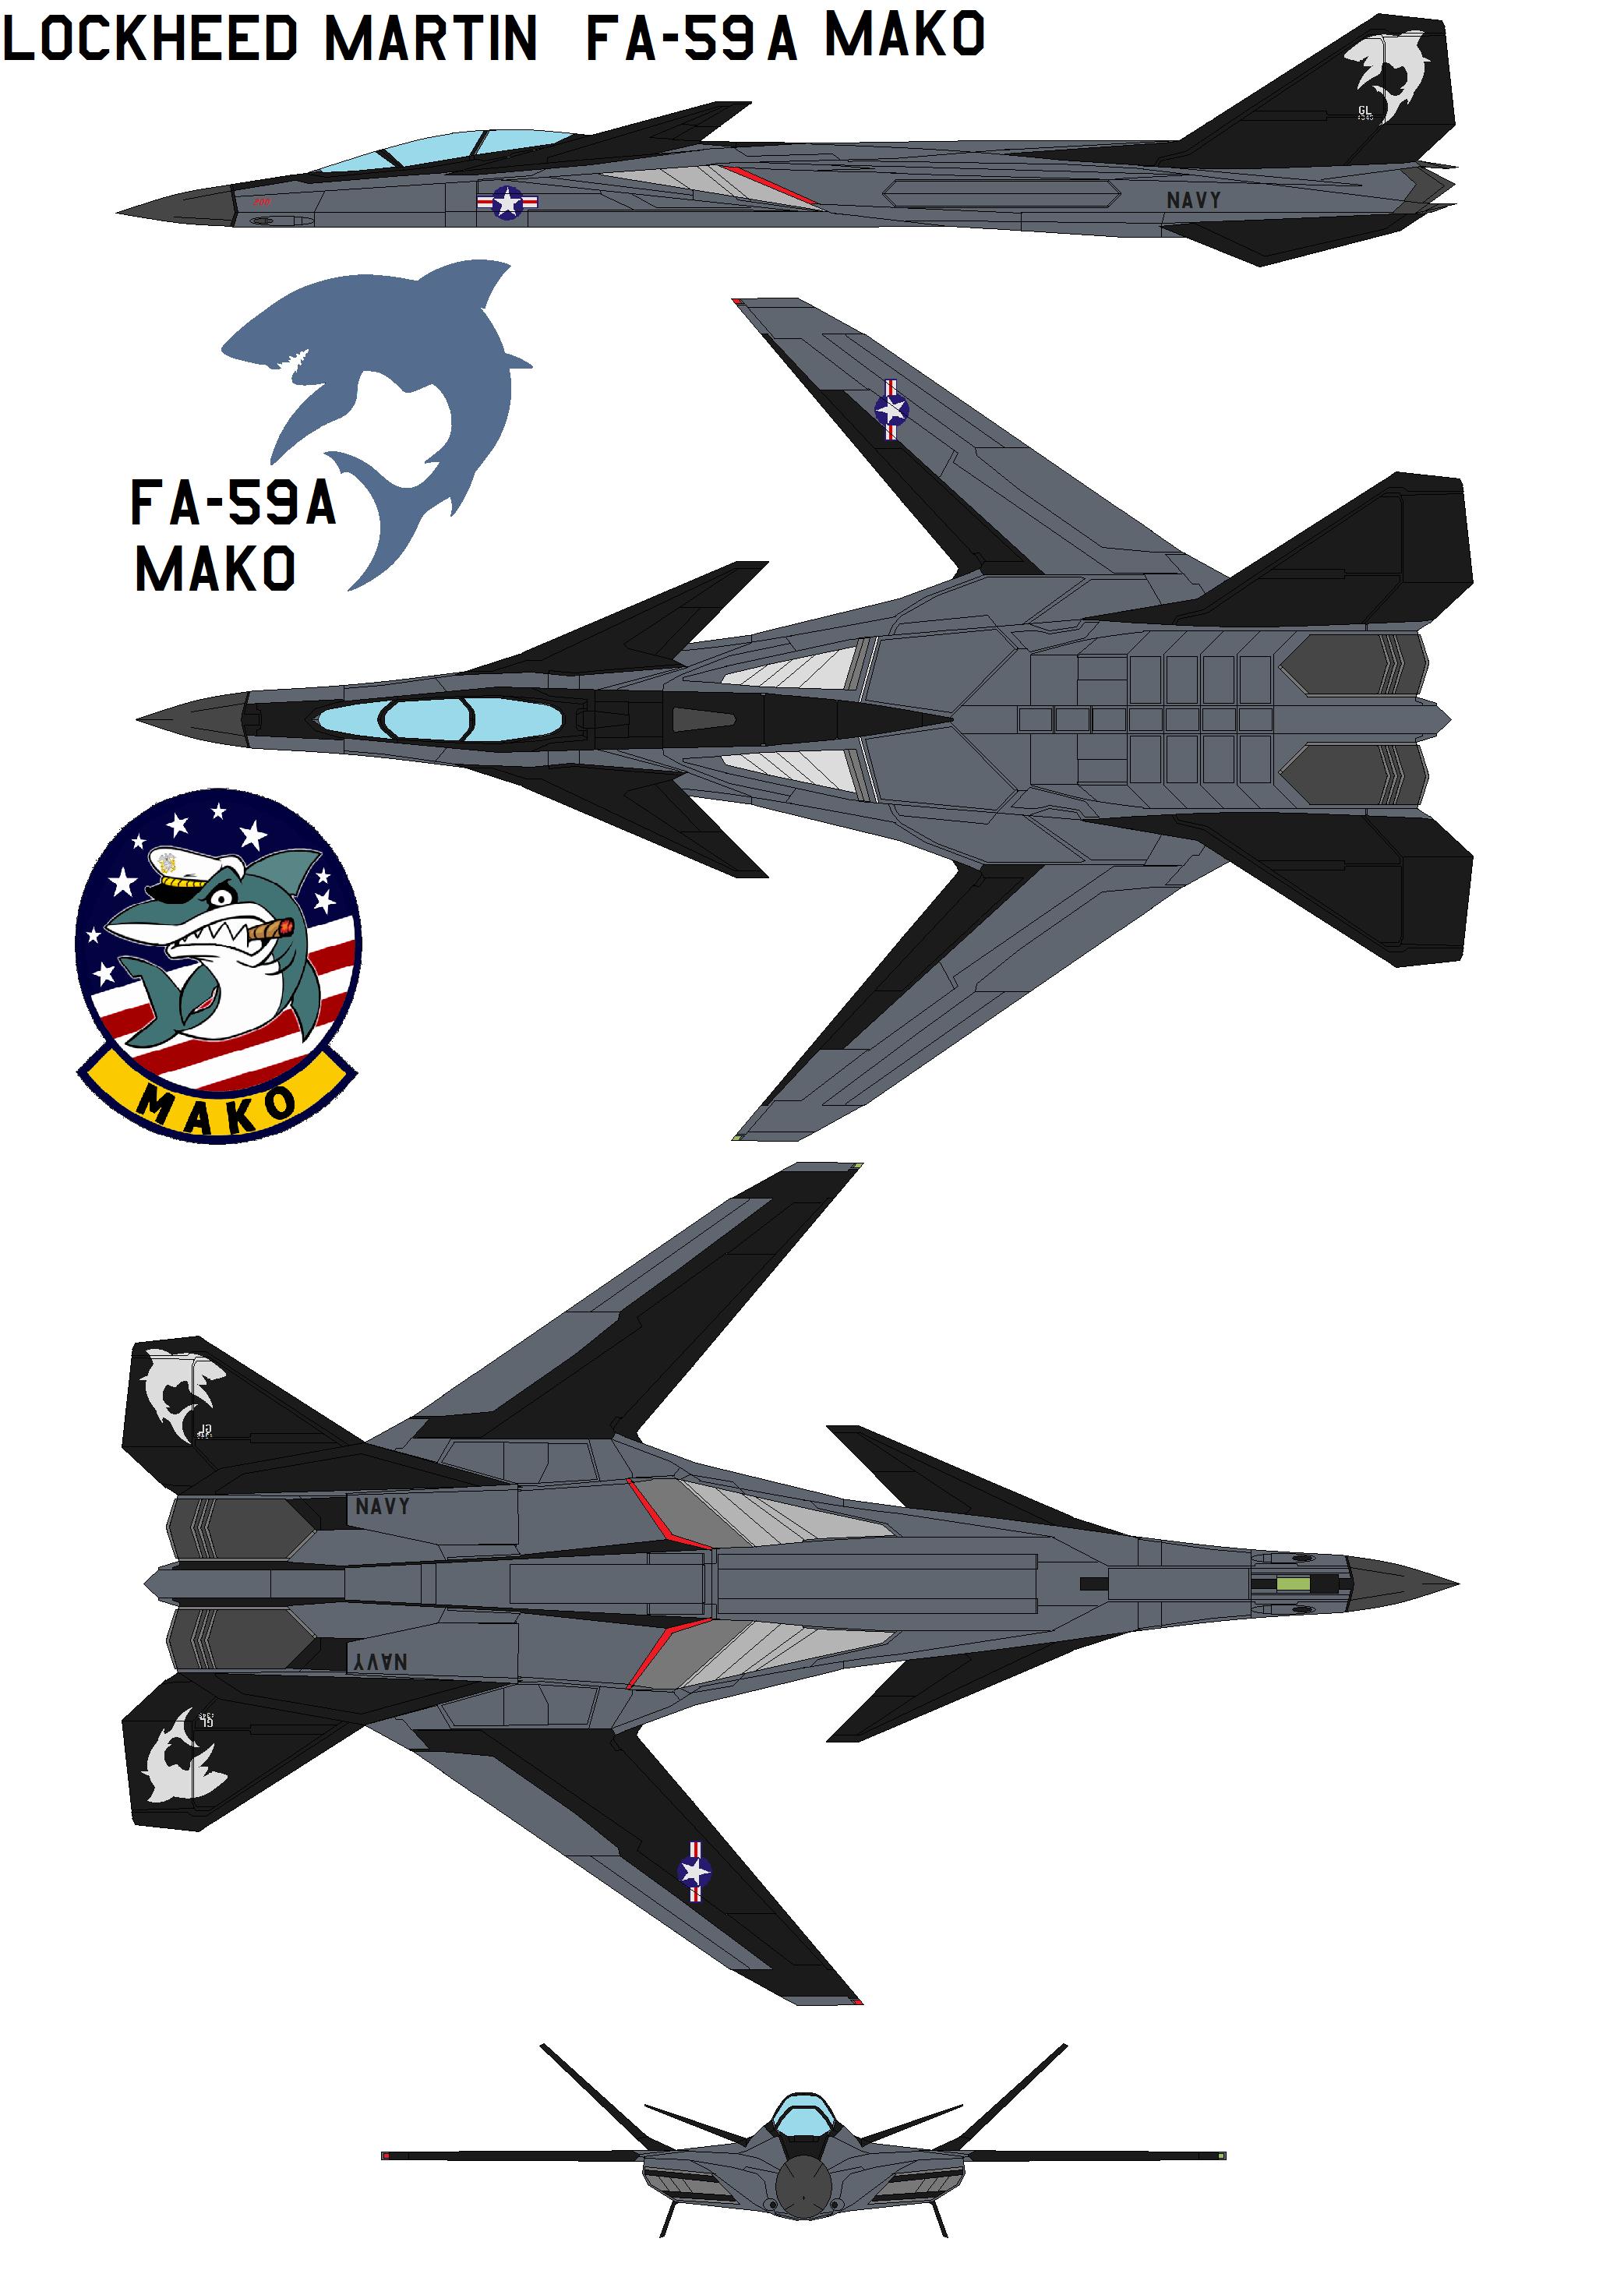 Lockheed Martin  FA-59A Mako by bagera3005